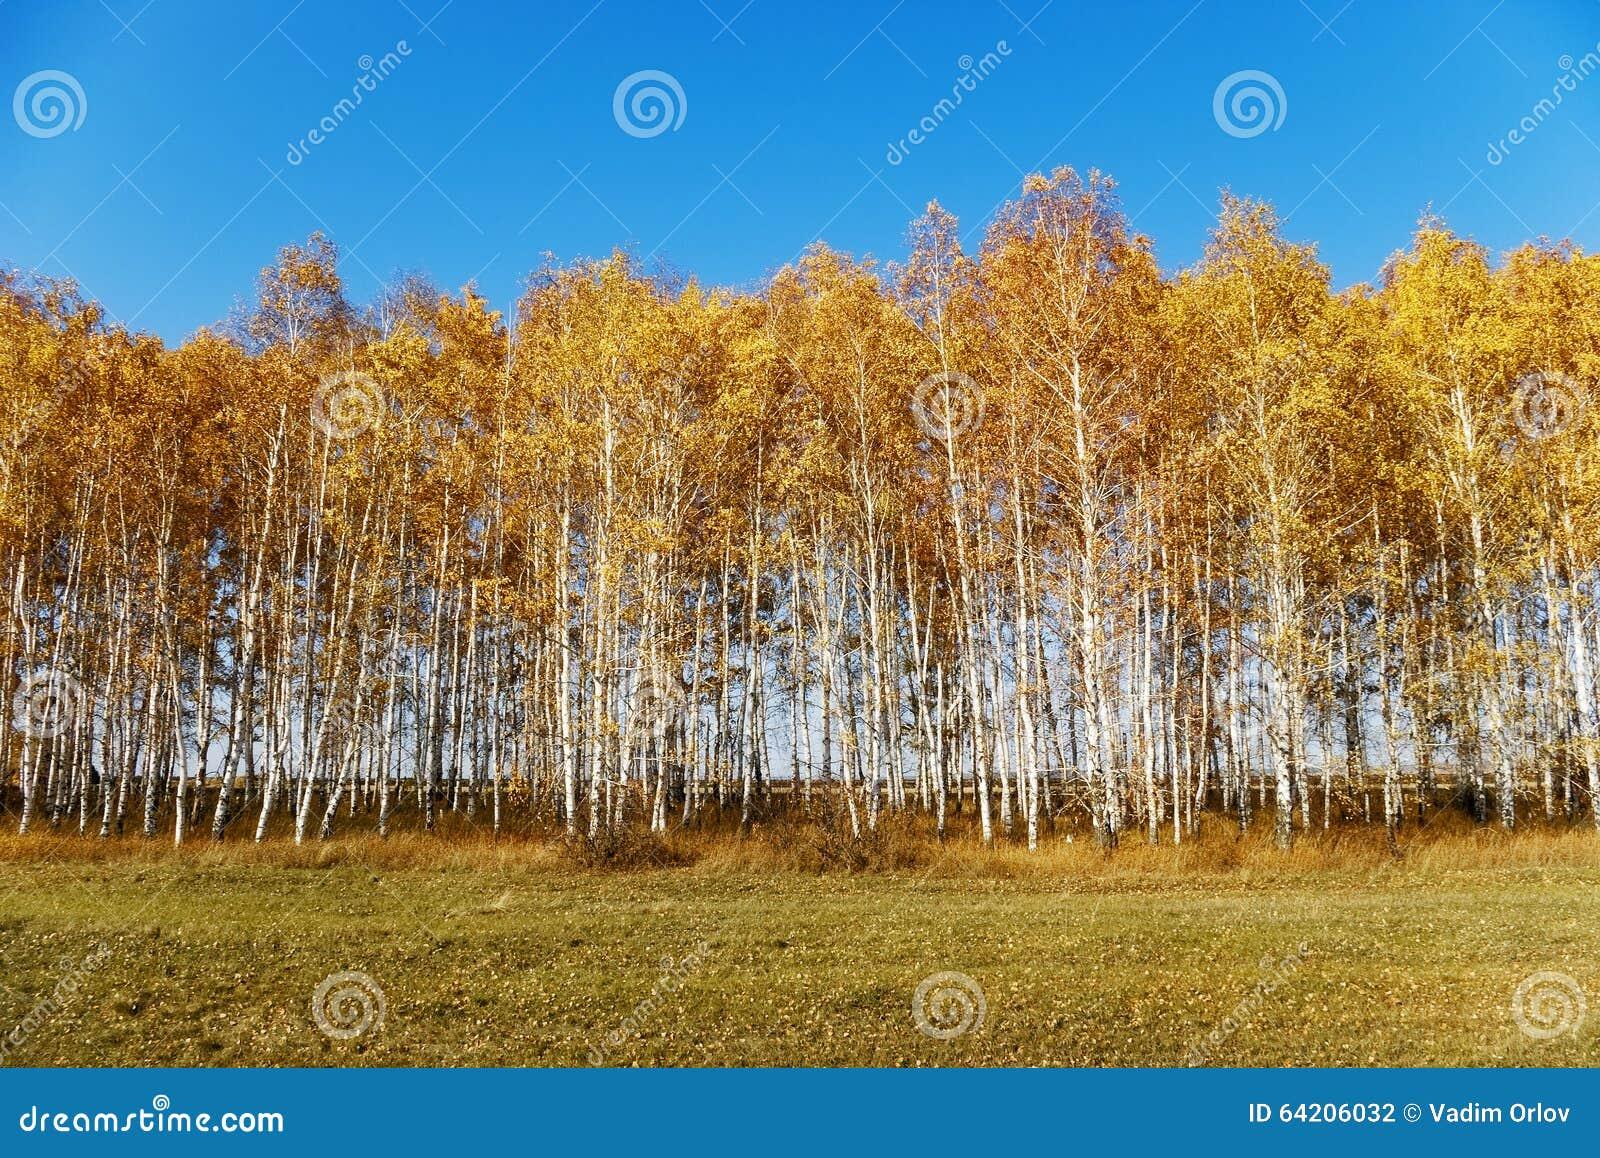 Paisaje del otoño con los abedules